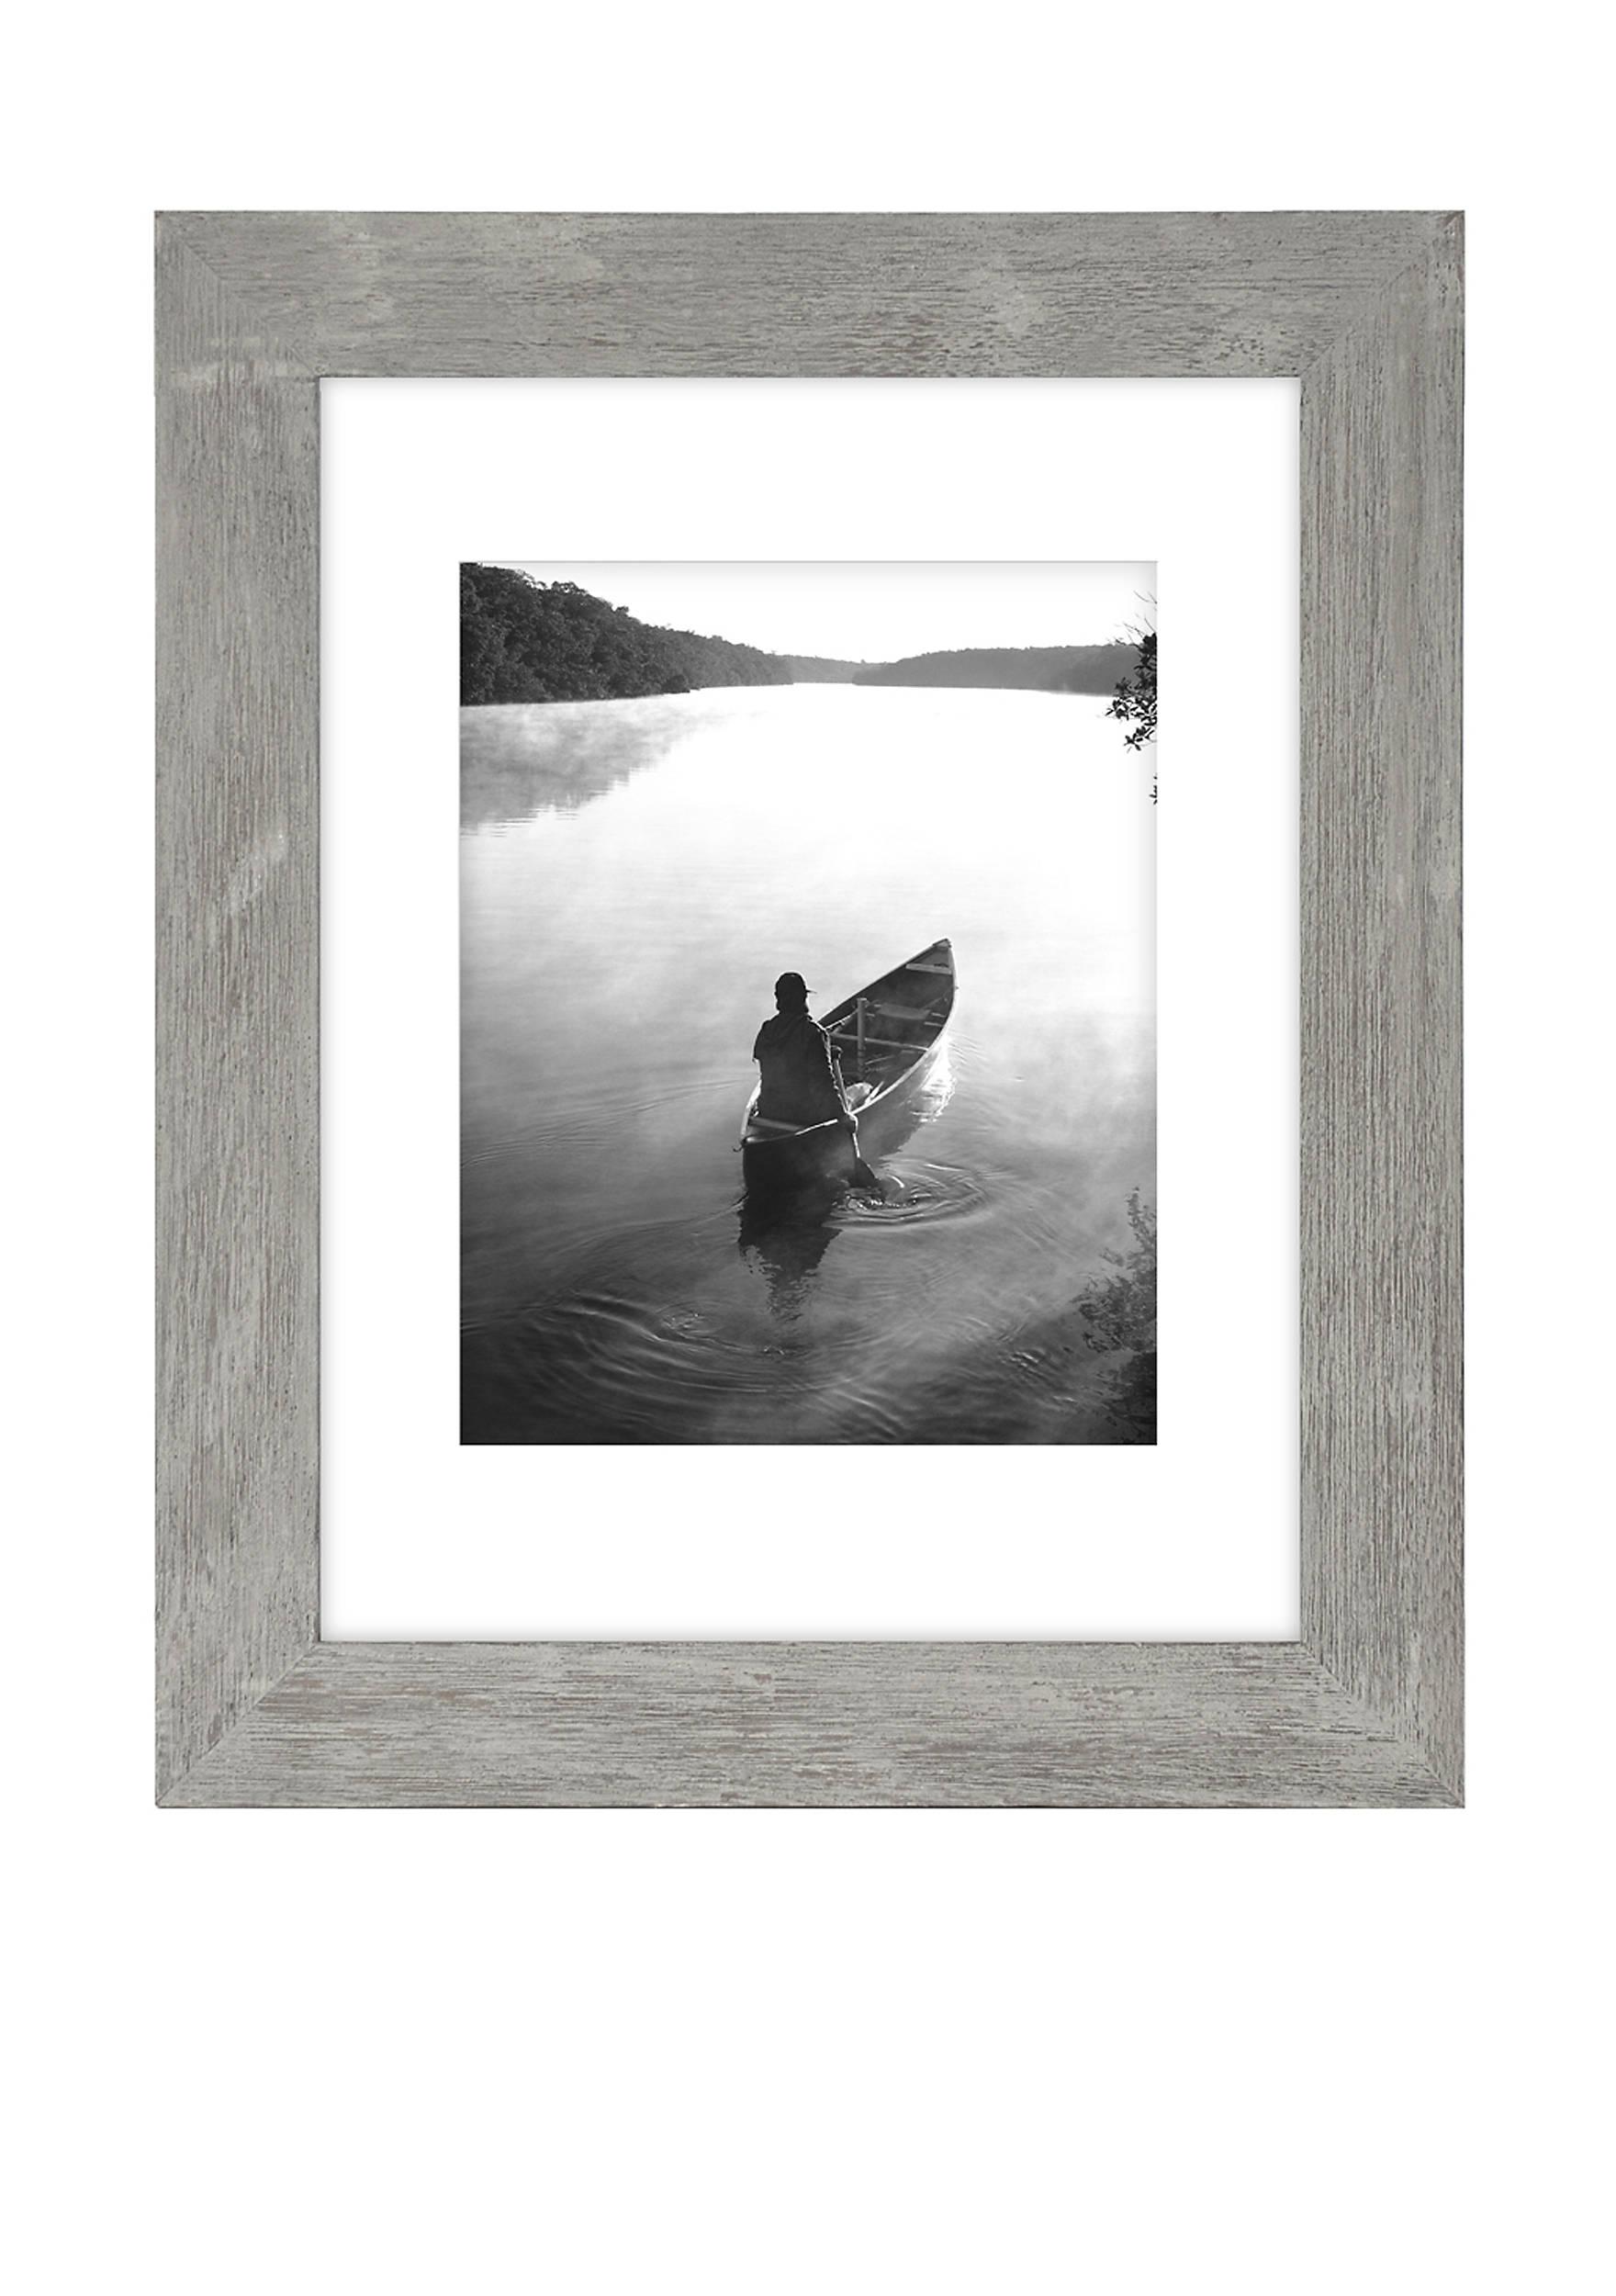 images driftwood - Driftwood Frame